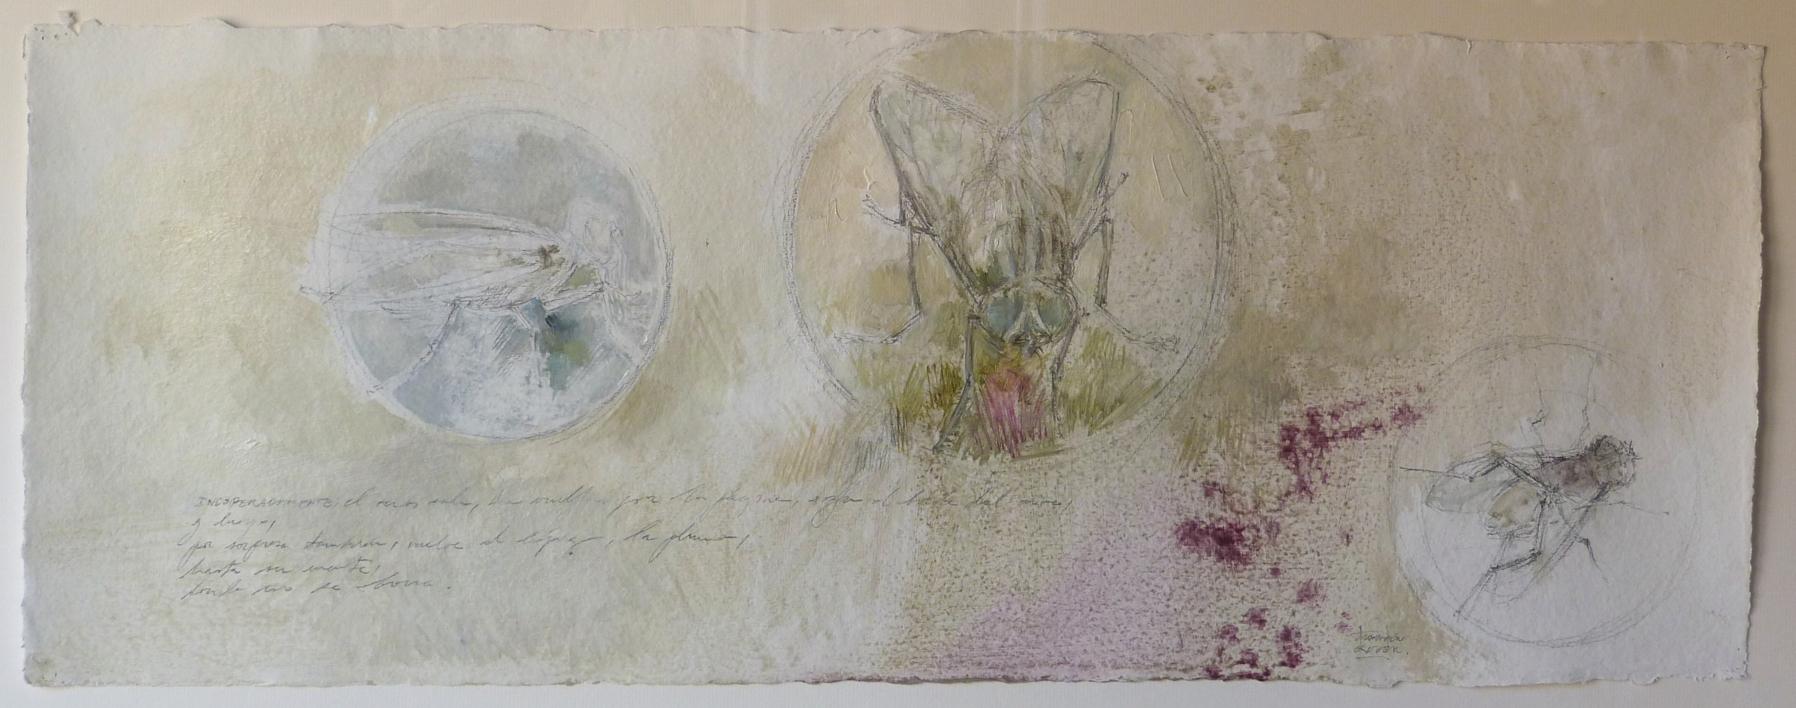 """Insectos"" |Dibujo de Carmen Roger | Compra arte en Flecha.es"